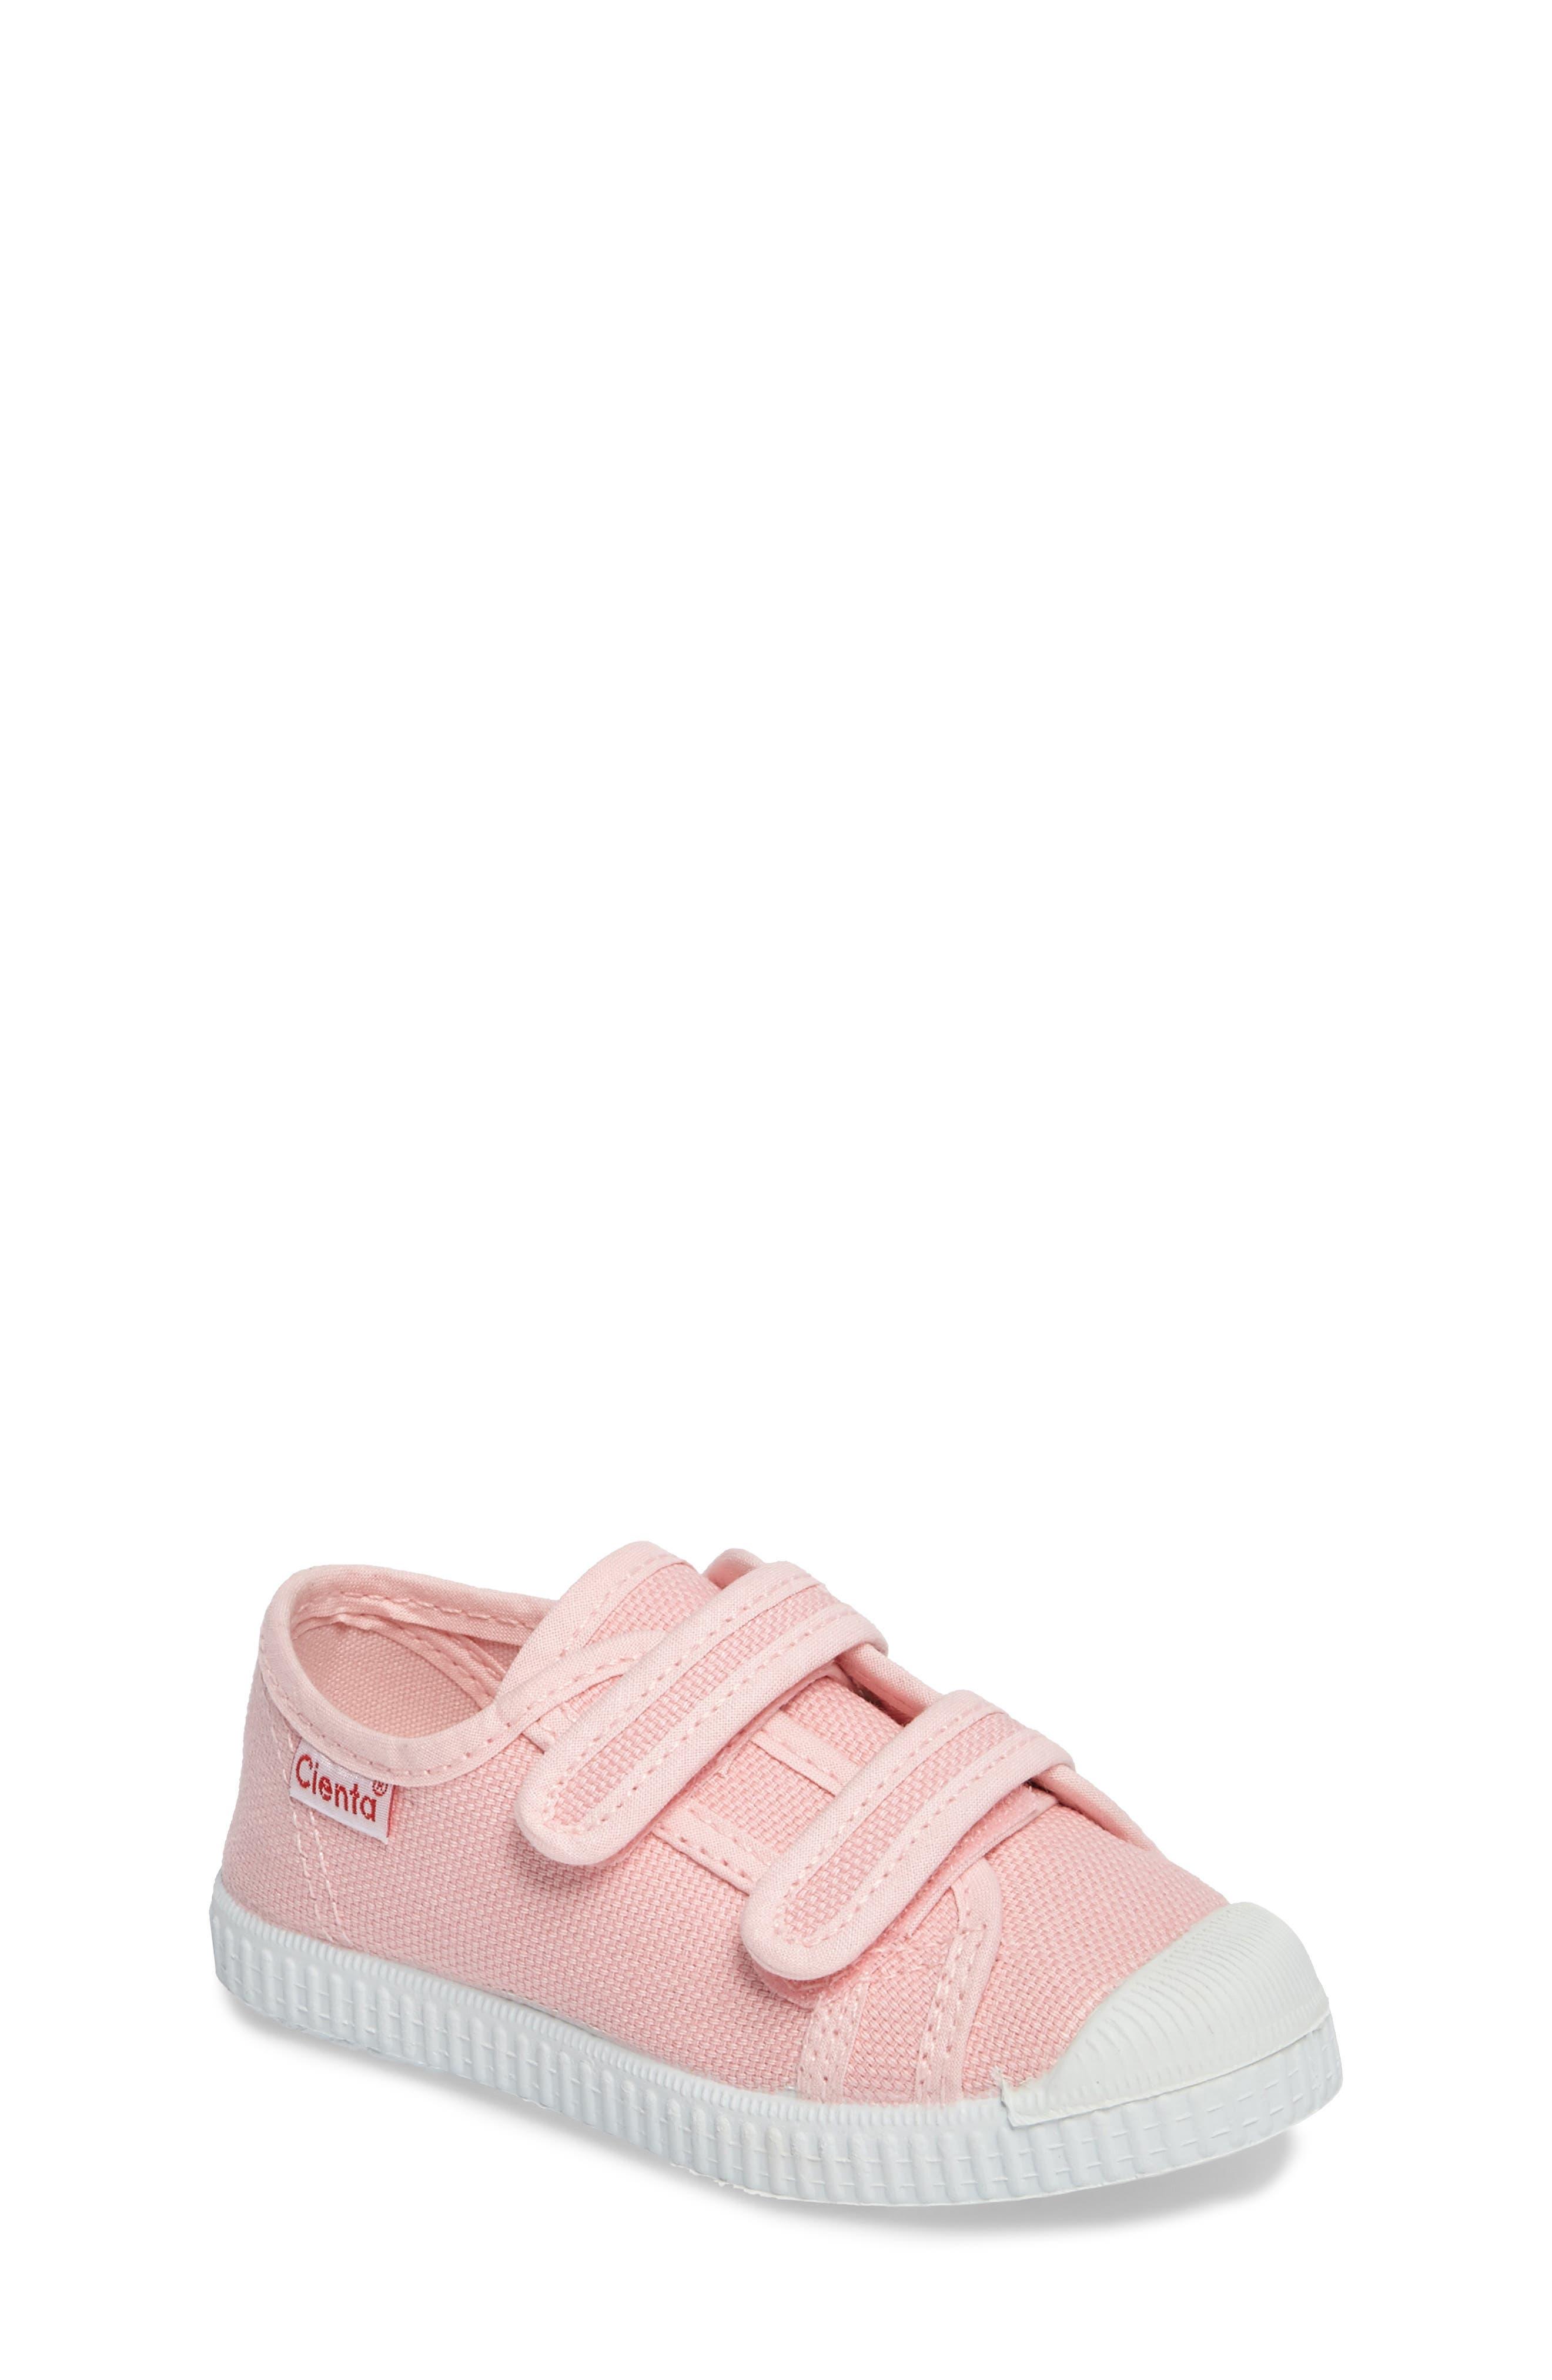 Main Image - Cienta Canvas Sneaker (Walker & Toddler)